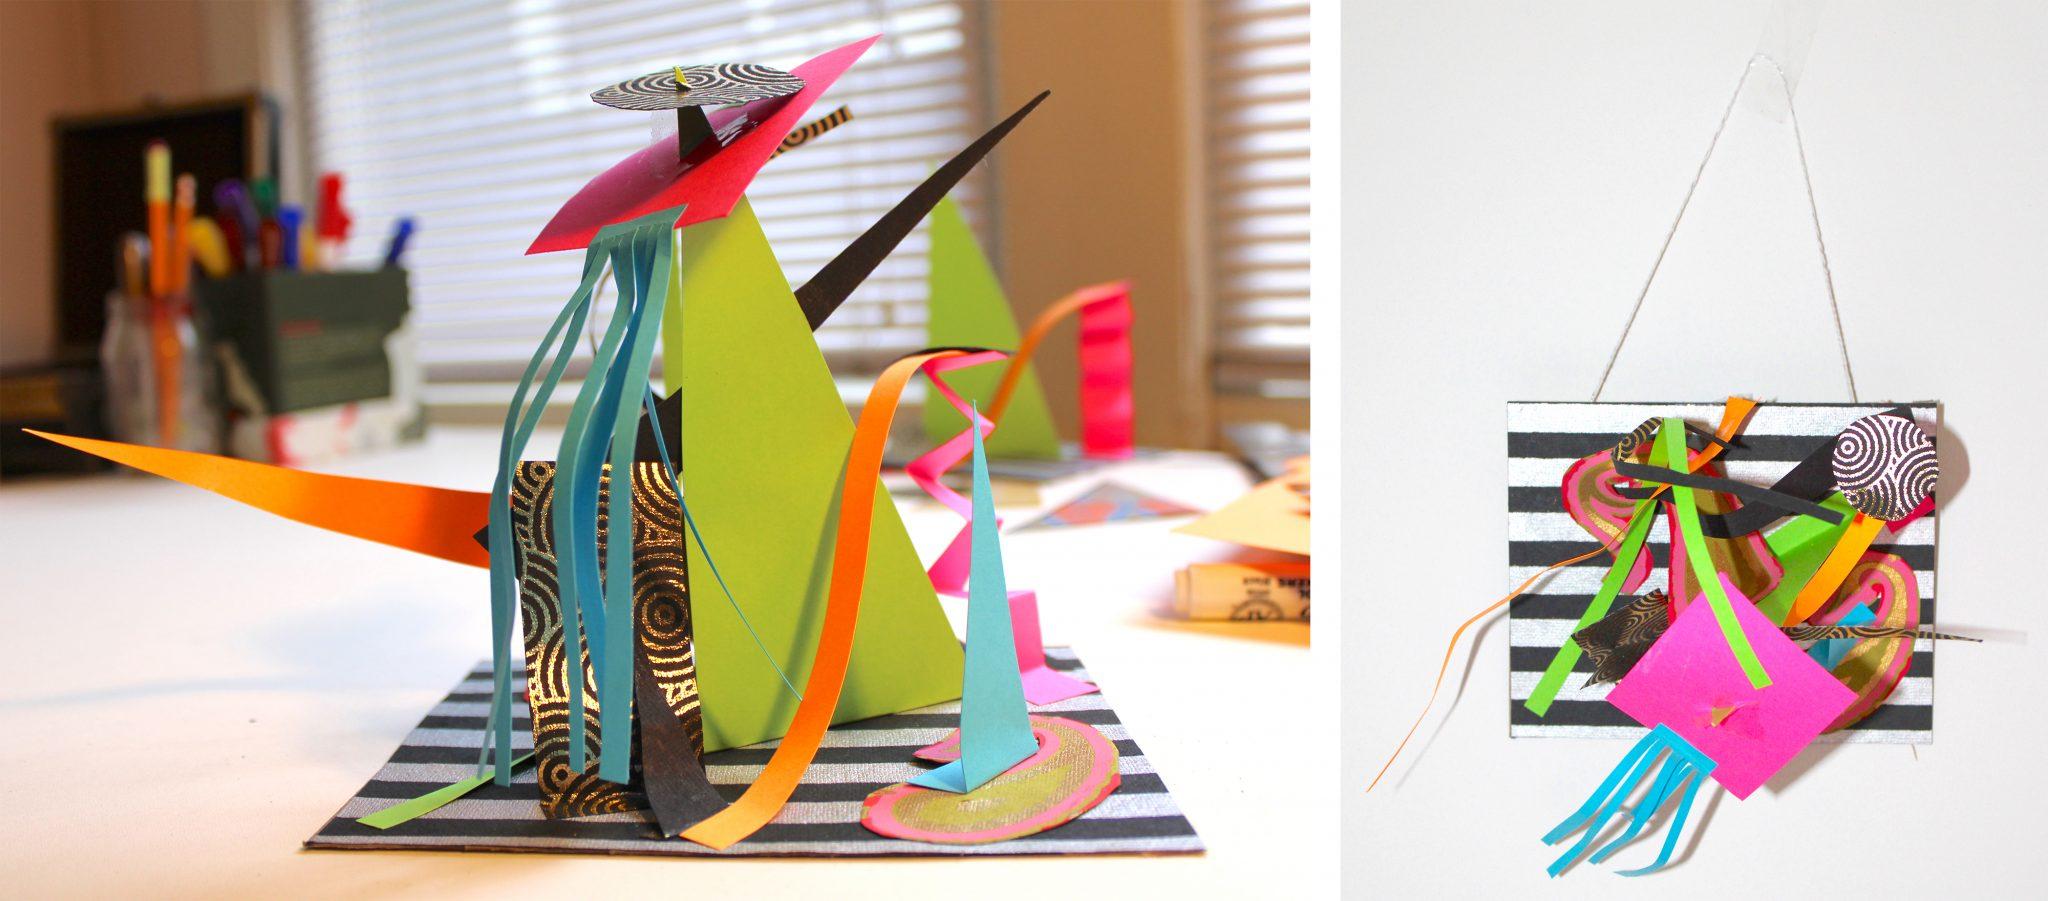 LACMA @ Home - Make a Paper Sculpture